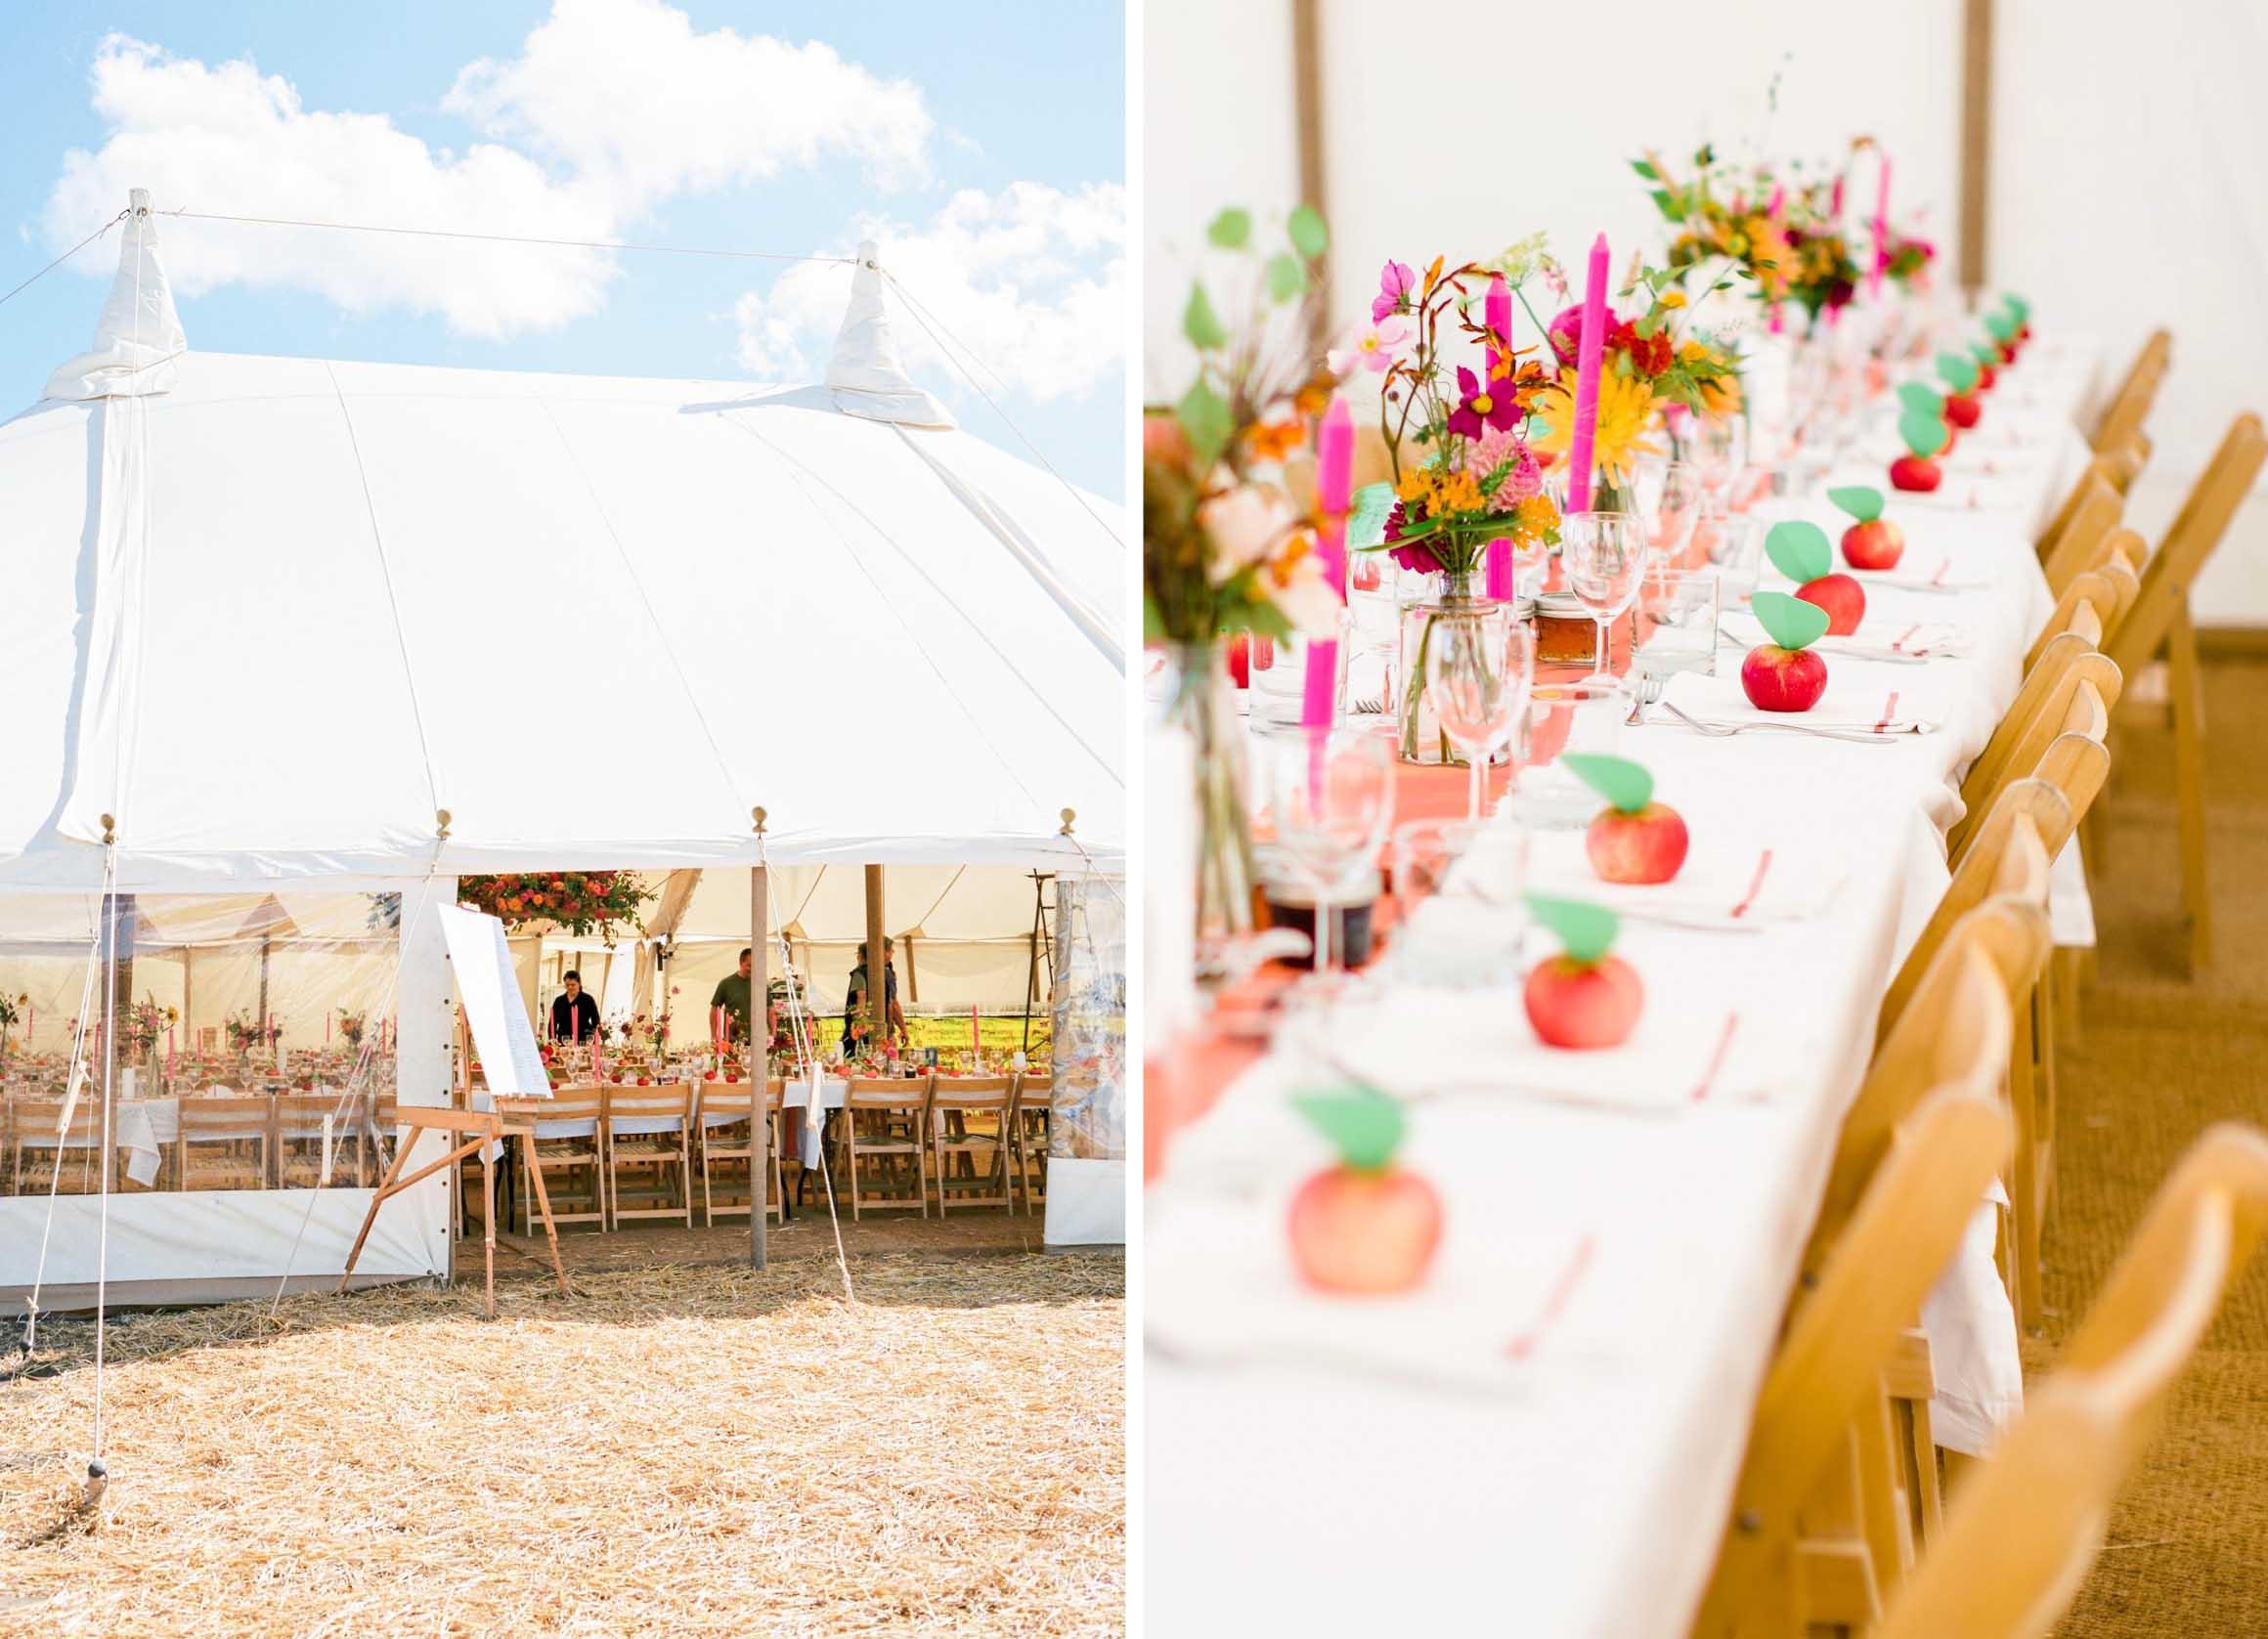 Amy O'Boyle Photography, Destination & UK Fine Art Film Wedding Photographer, DIY Carnival Farm Wedding with May Pole 2.jpg